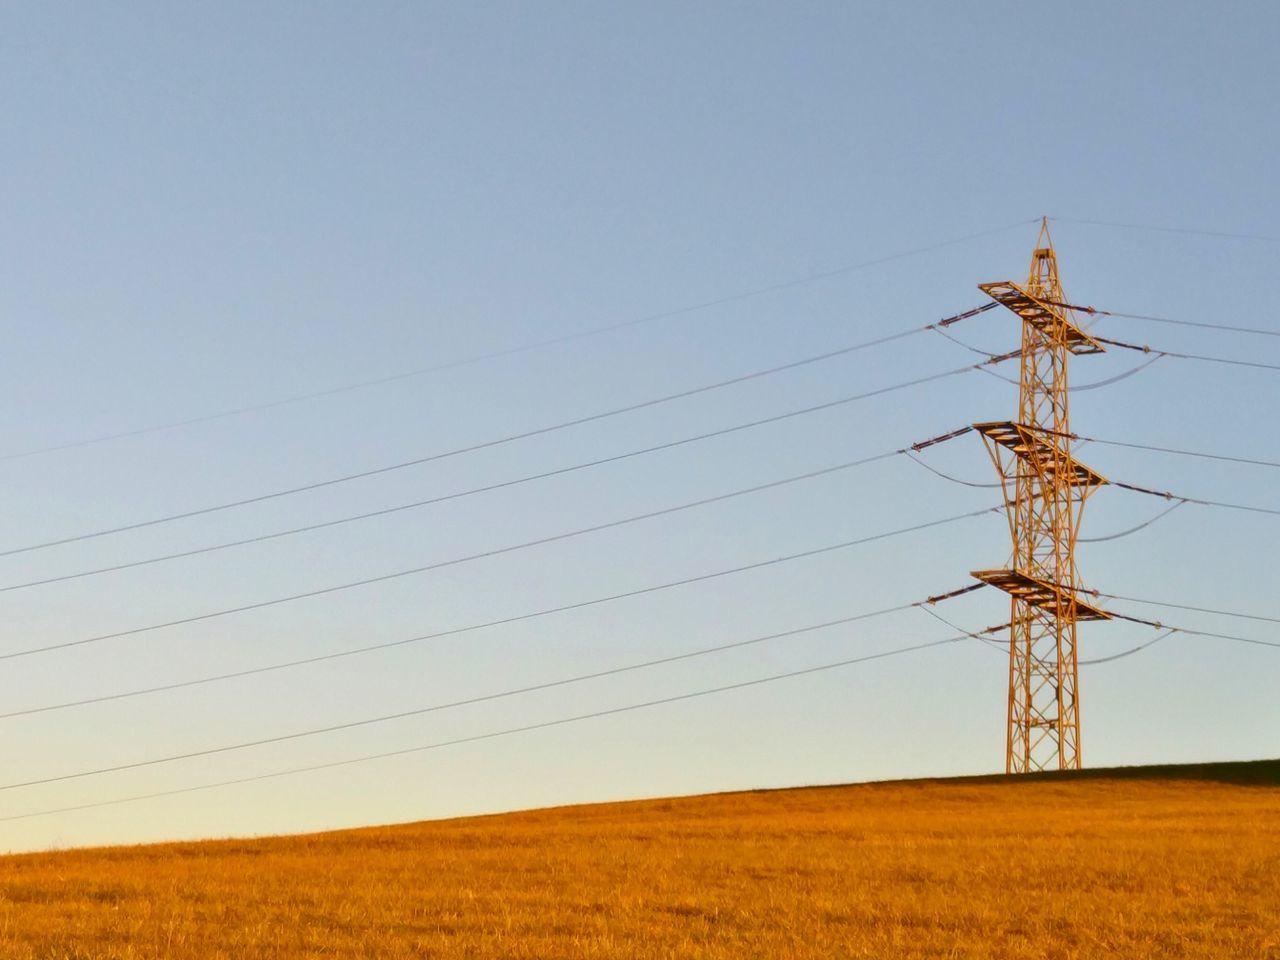 Electricity Pylon On Landscape Against Clear Sky